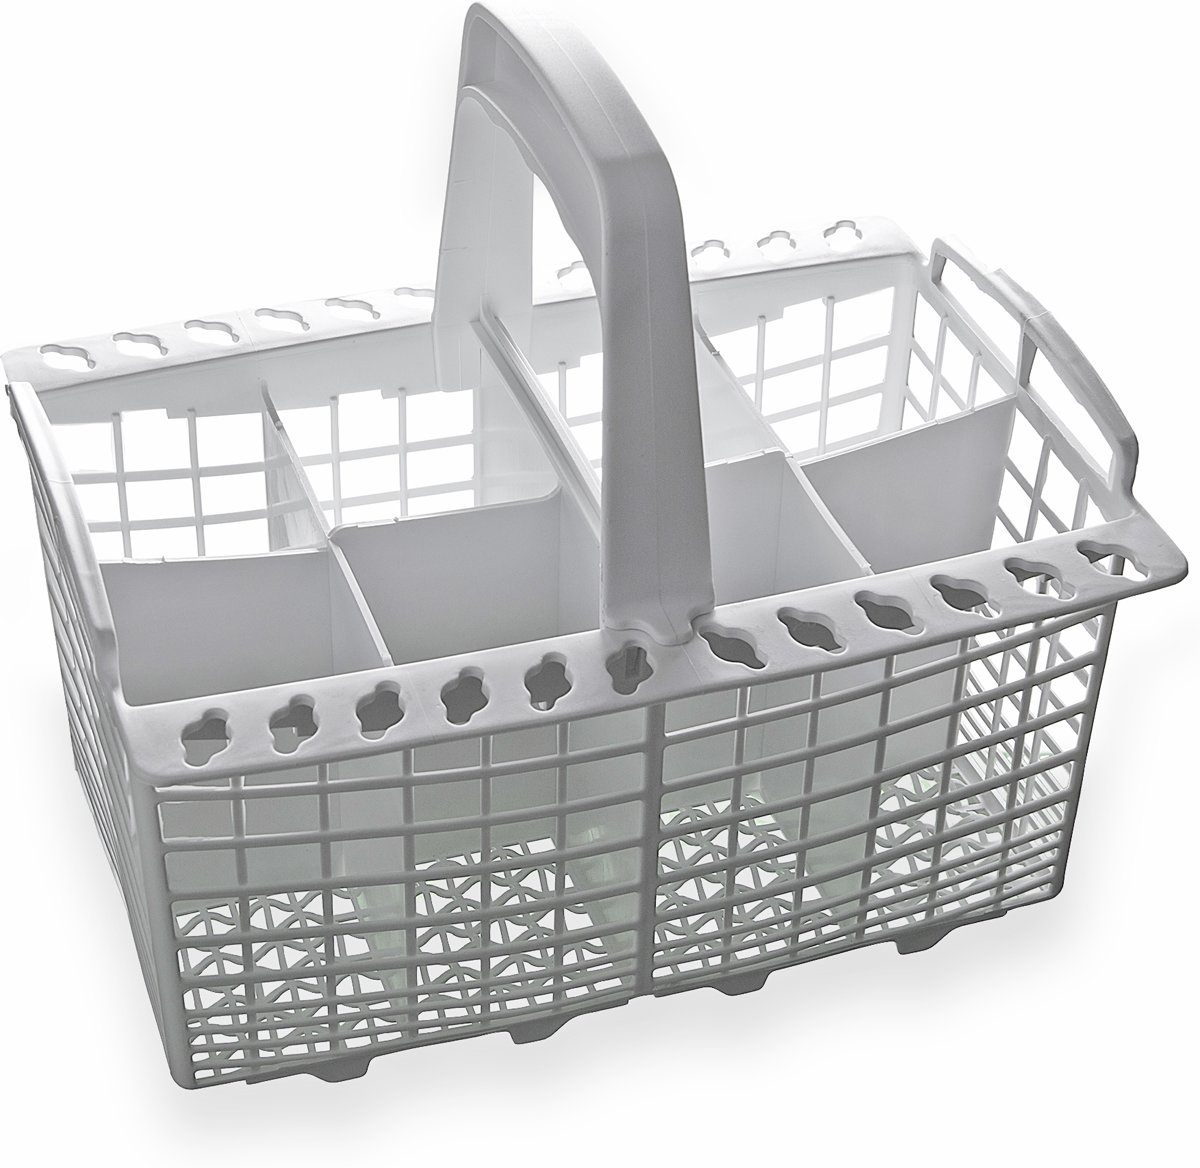 Ariston bestekmand vaatwasmachine kopen